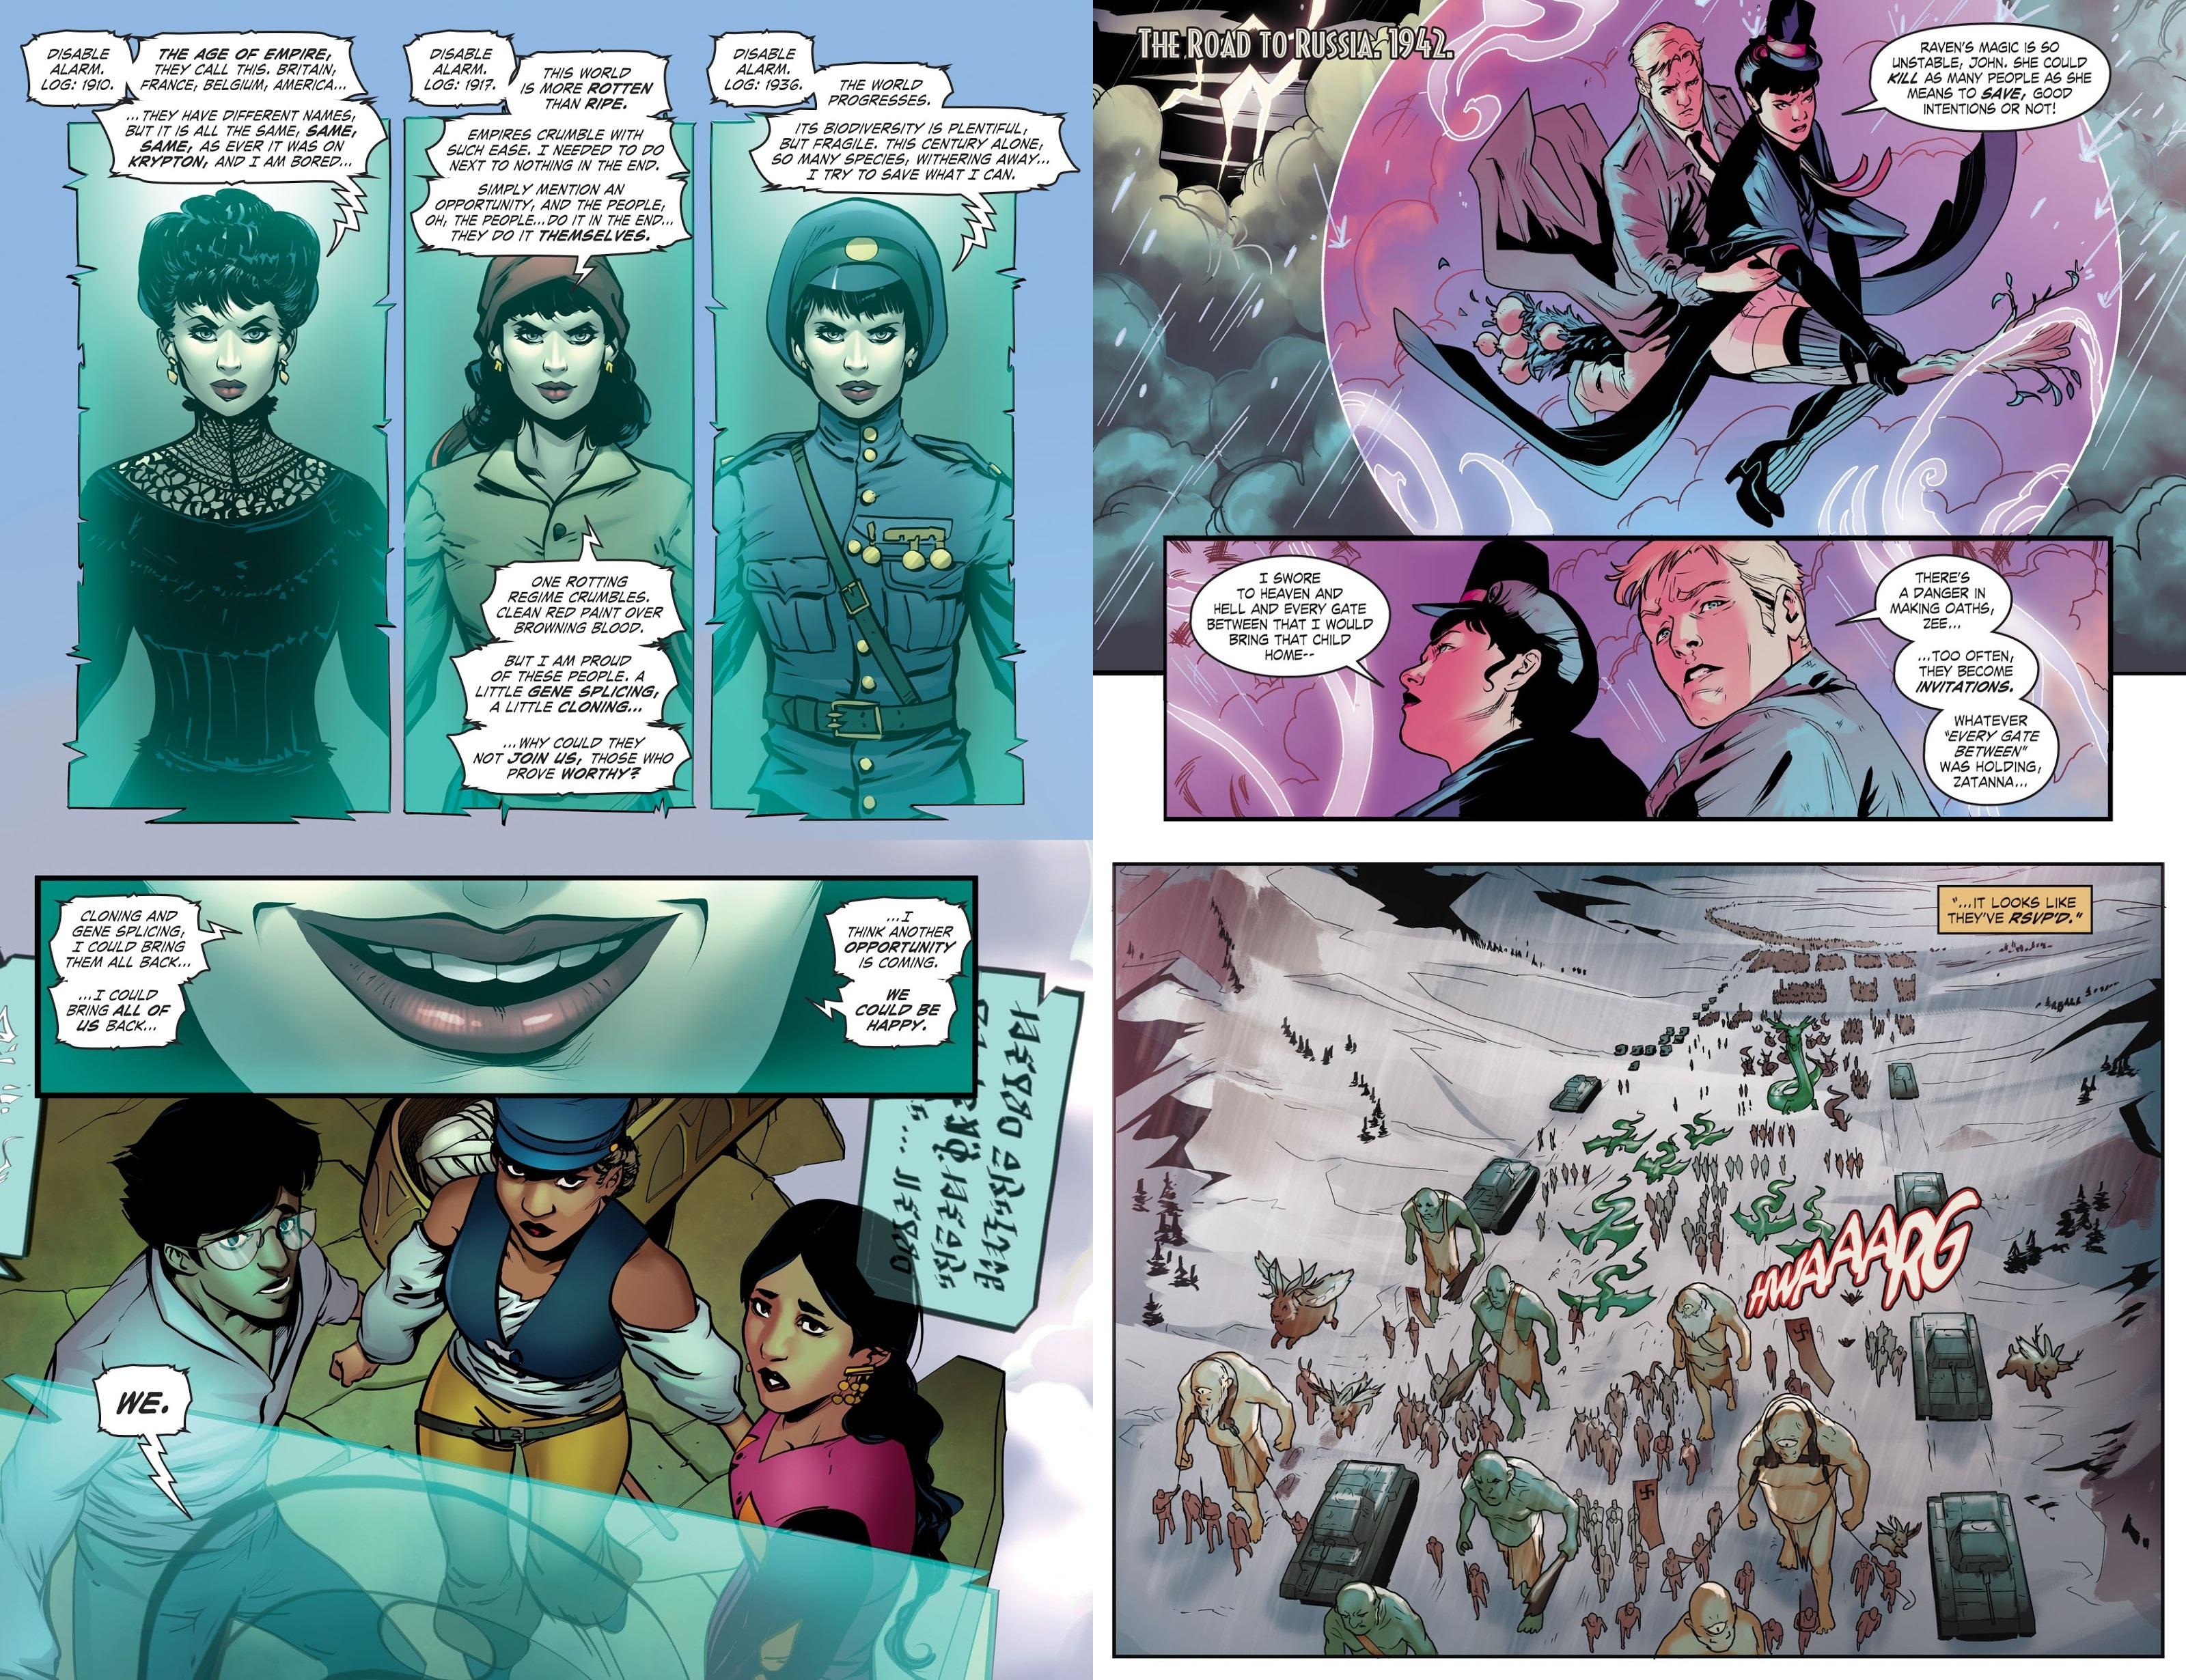 DC Comics Bombshells 6 War Stories review